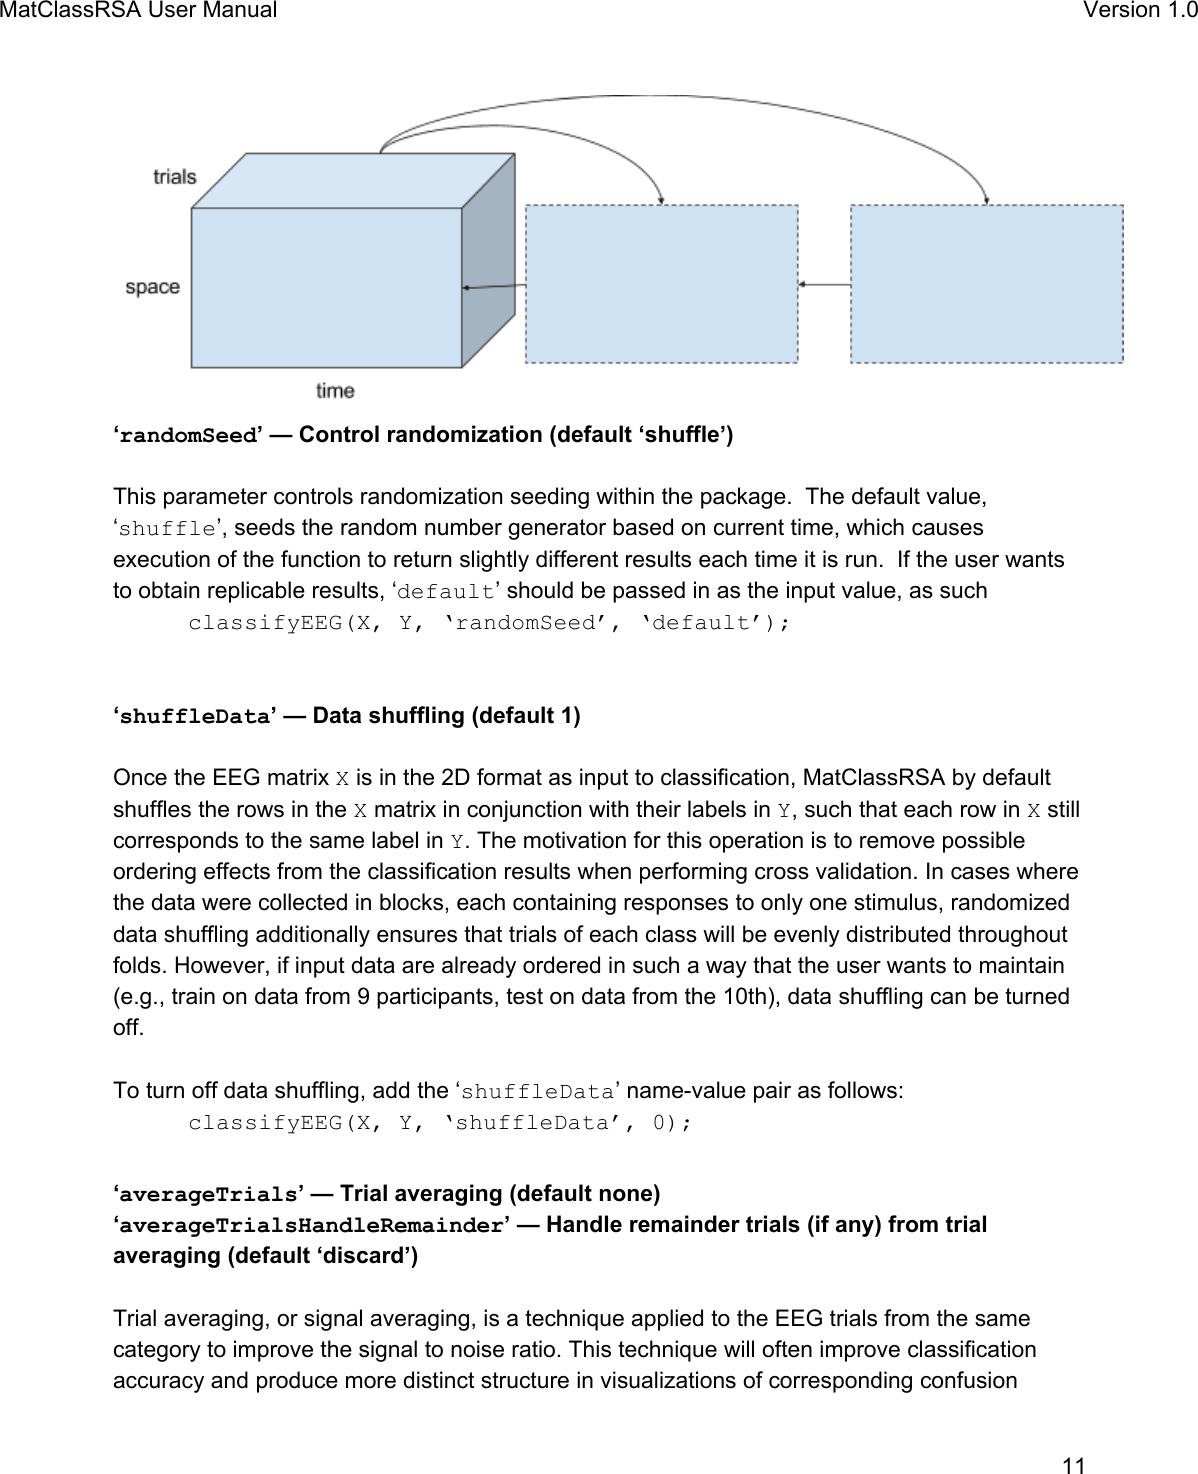 Mat Class RSA Manual